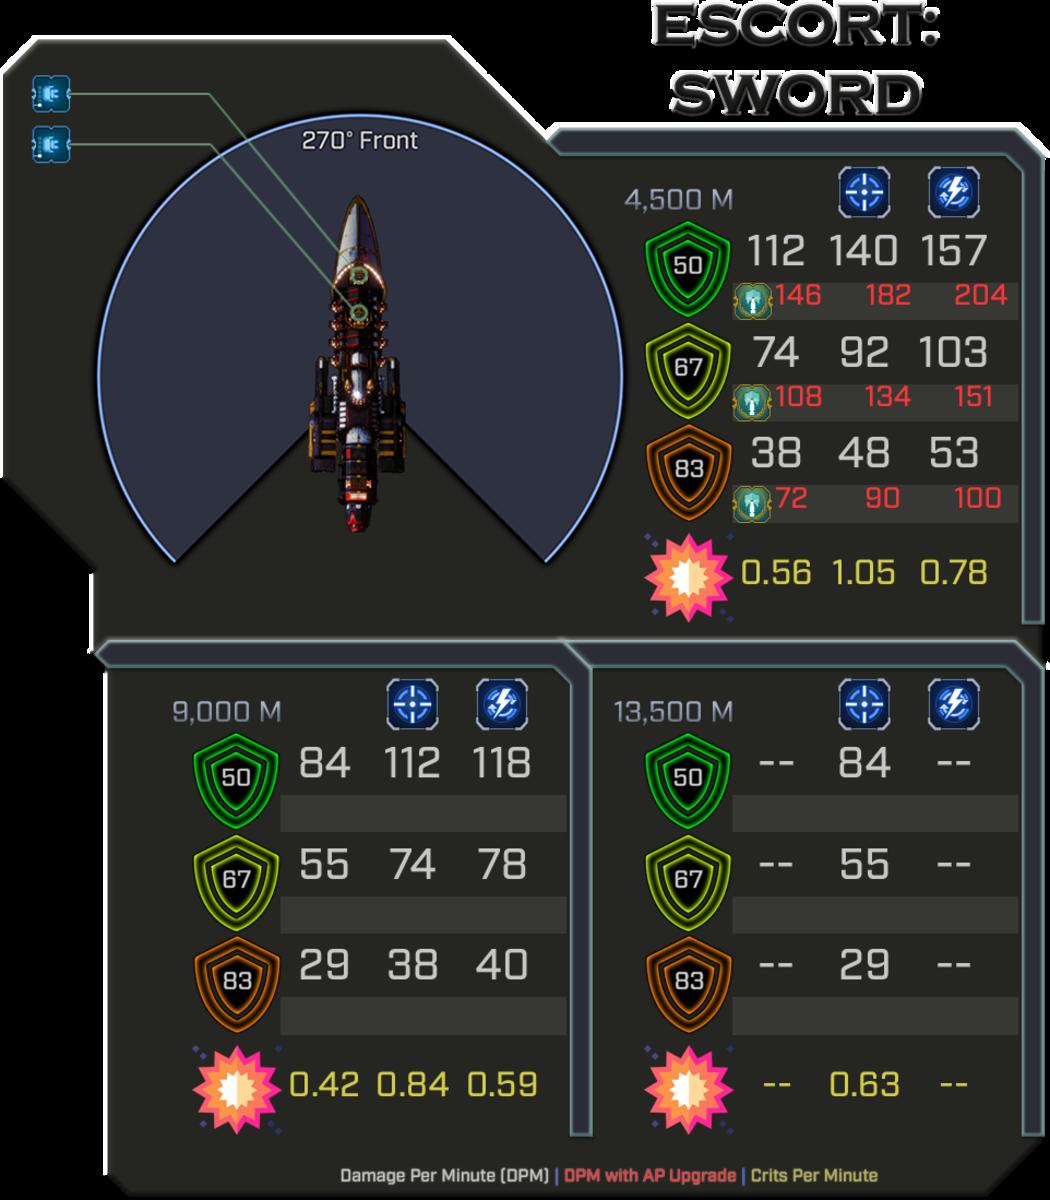 Ad-Mech Sword - Weapon Damage Profile